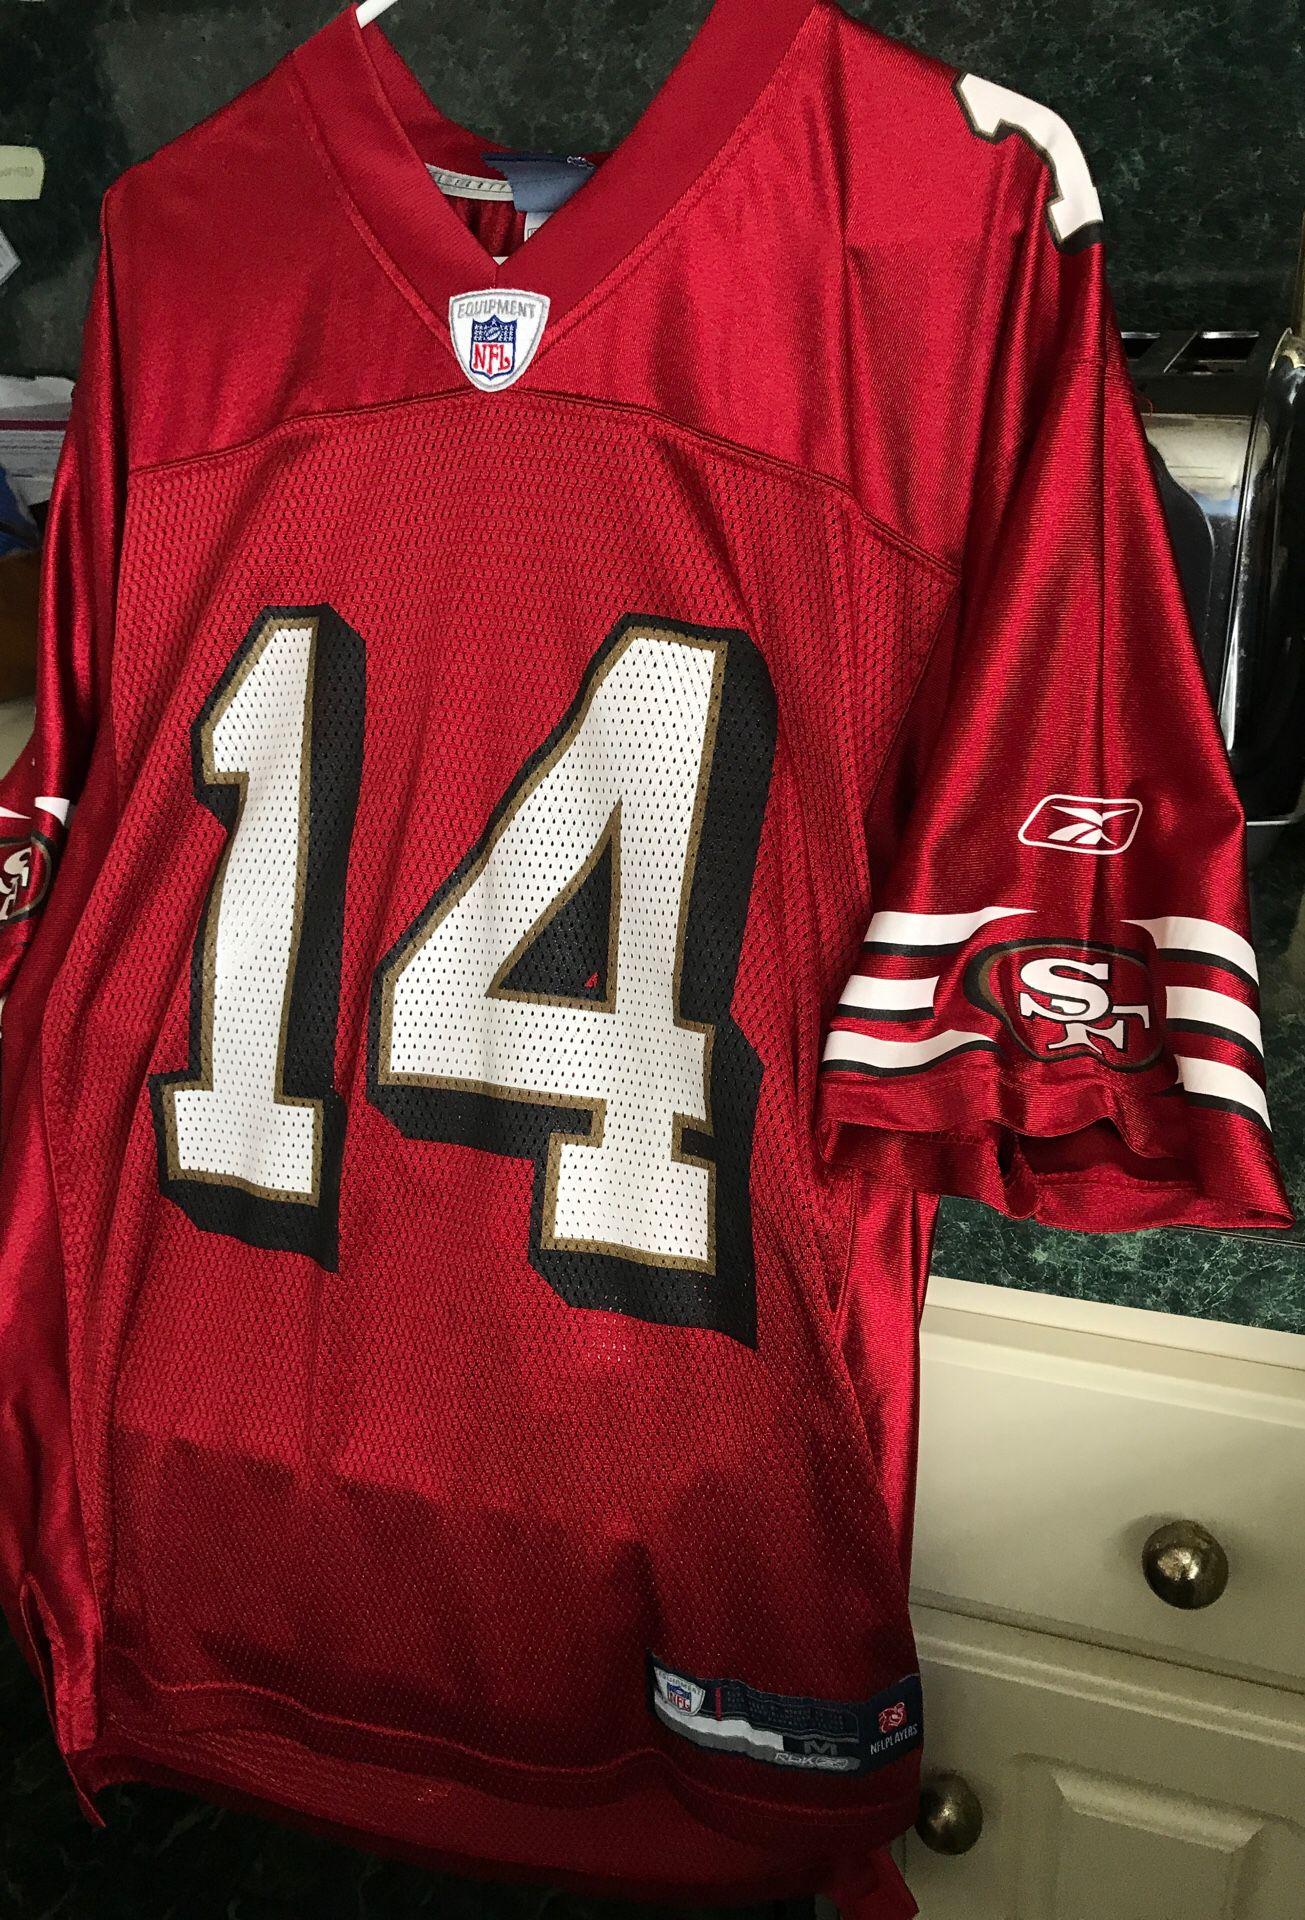 SAN FRANCISCO 49ers / O'SULLIVAN #14 JERSEY